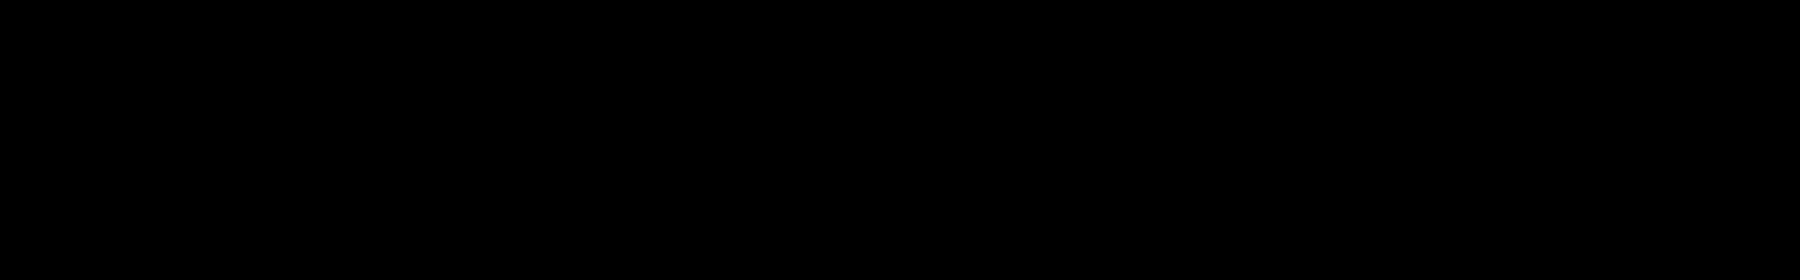 Vokoder Dizko audio waveform